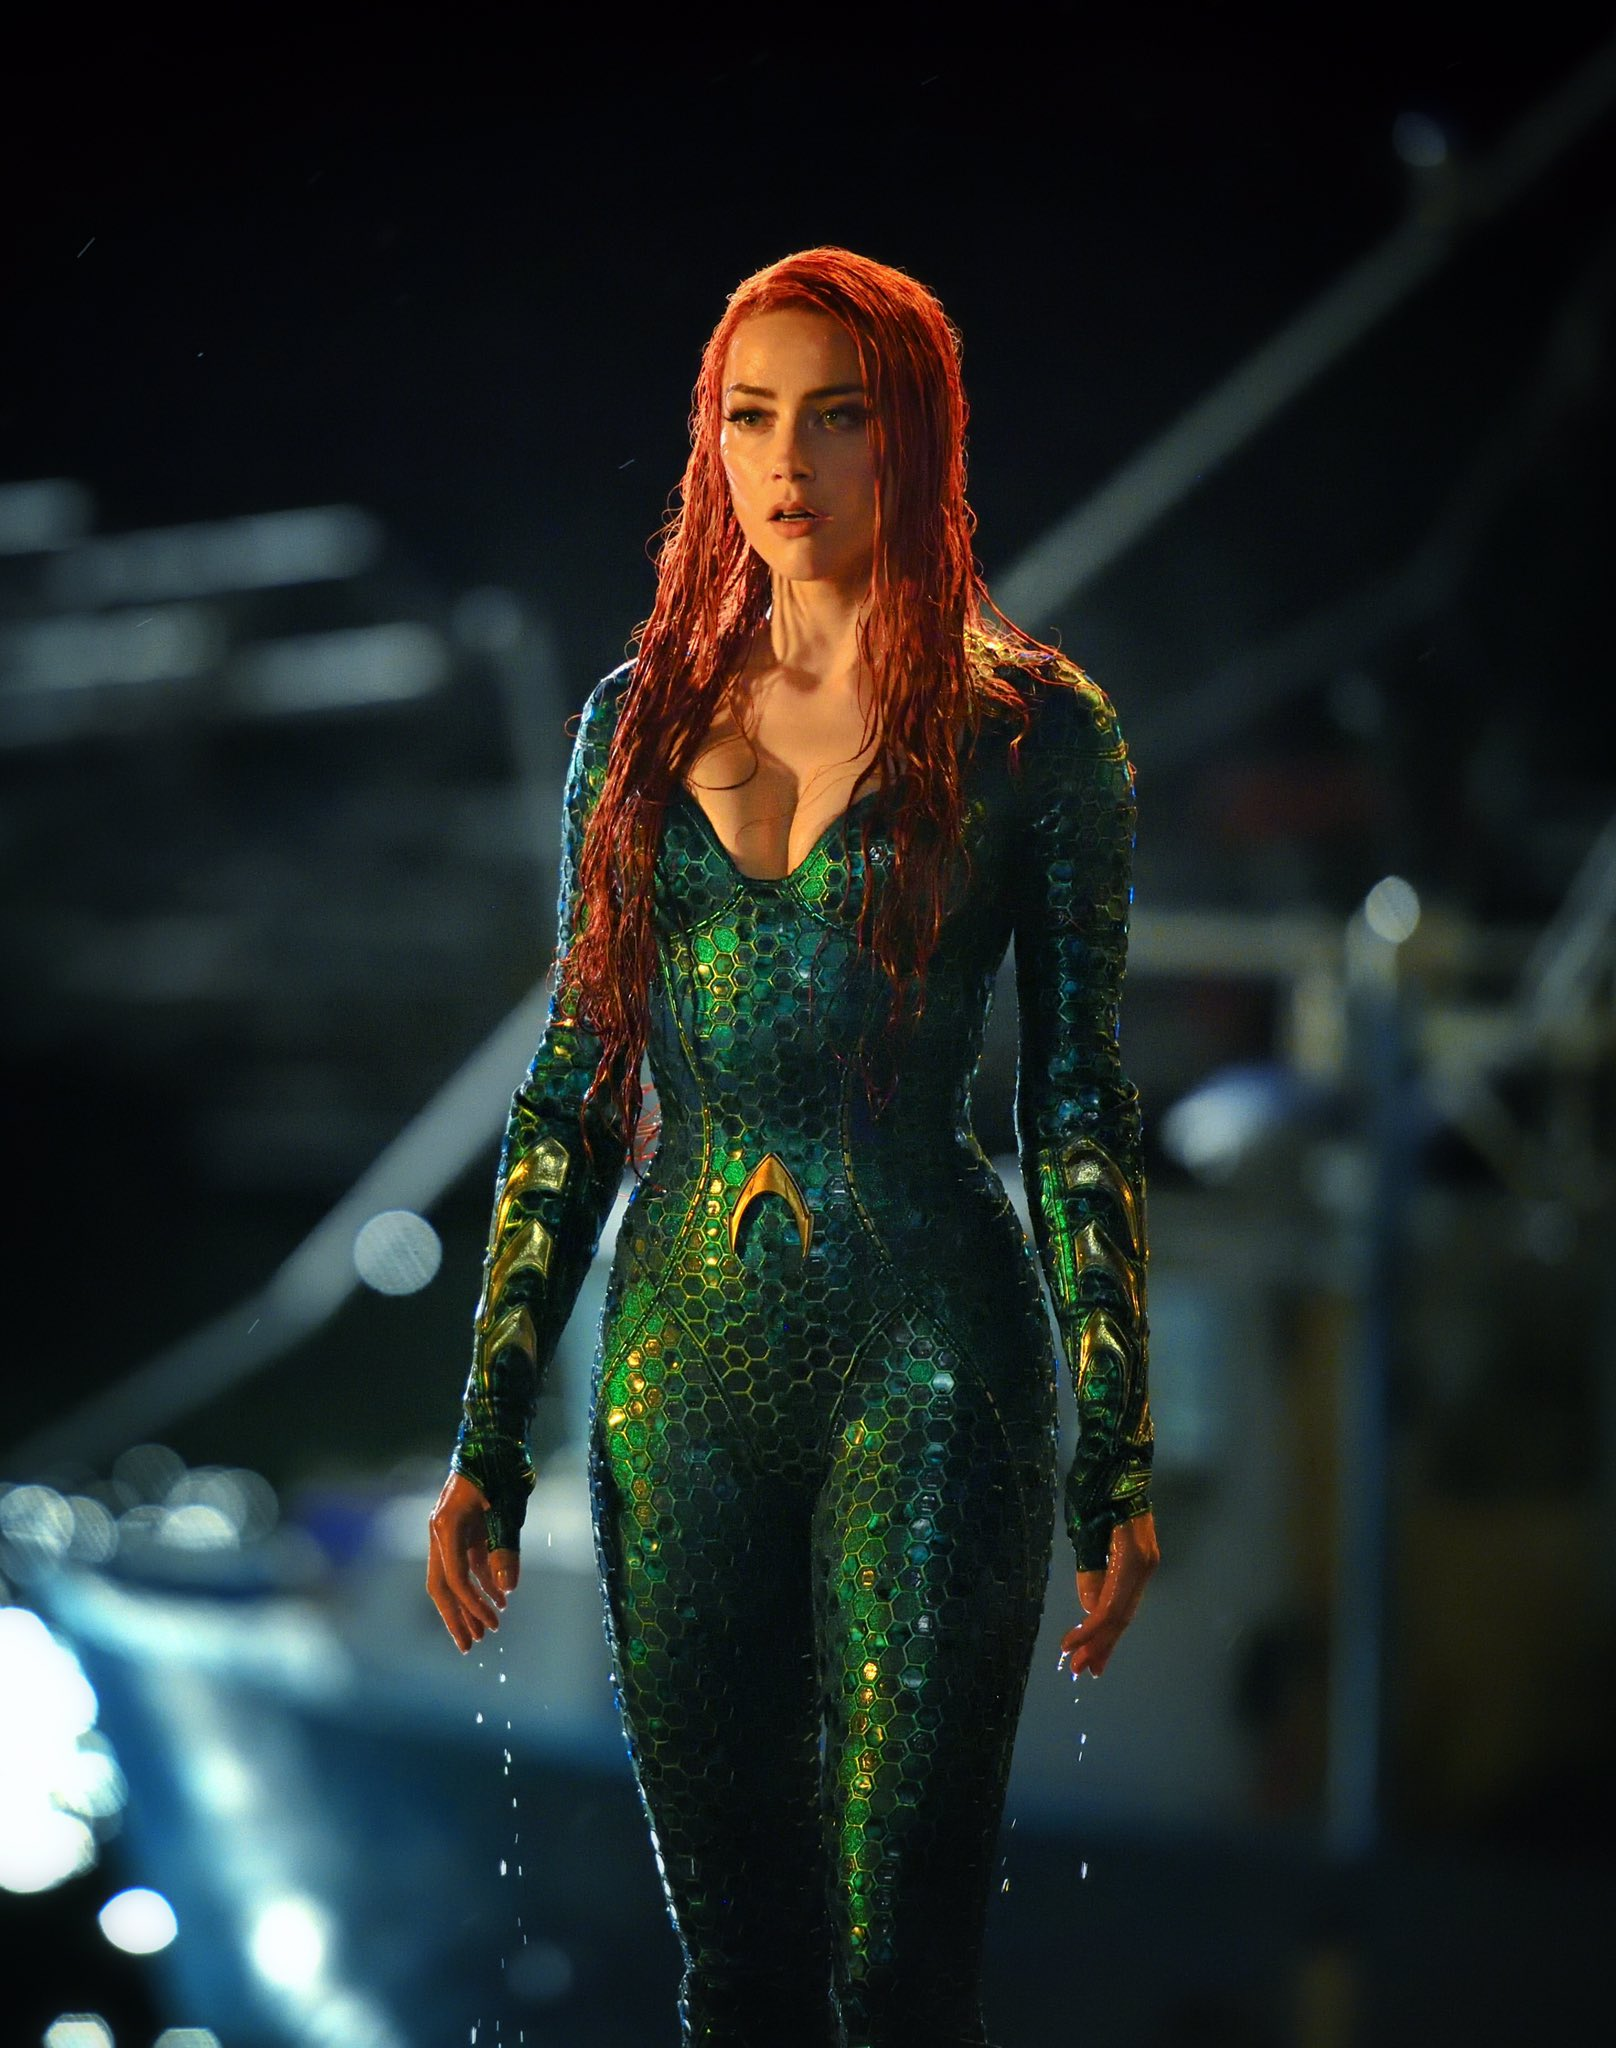 Amber-Heard-Mera-Aquaman-First-Look